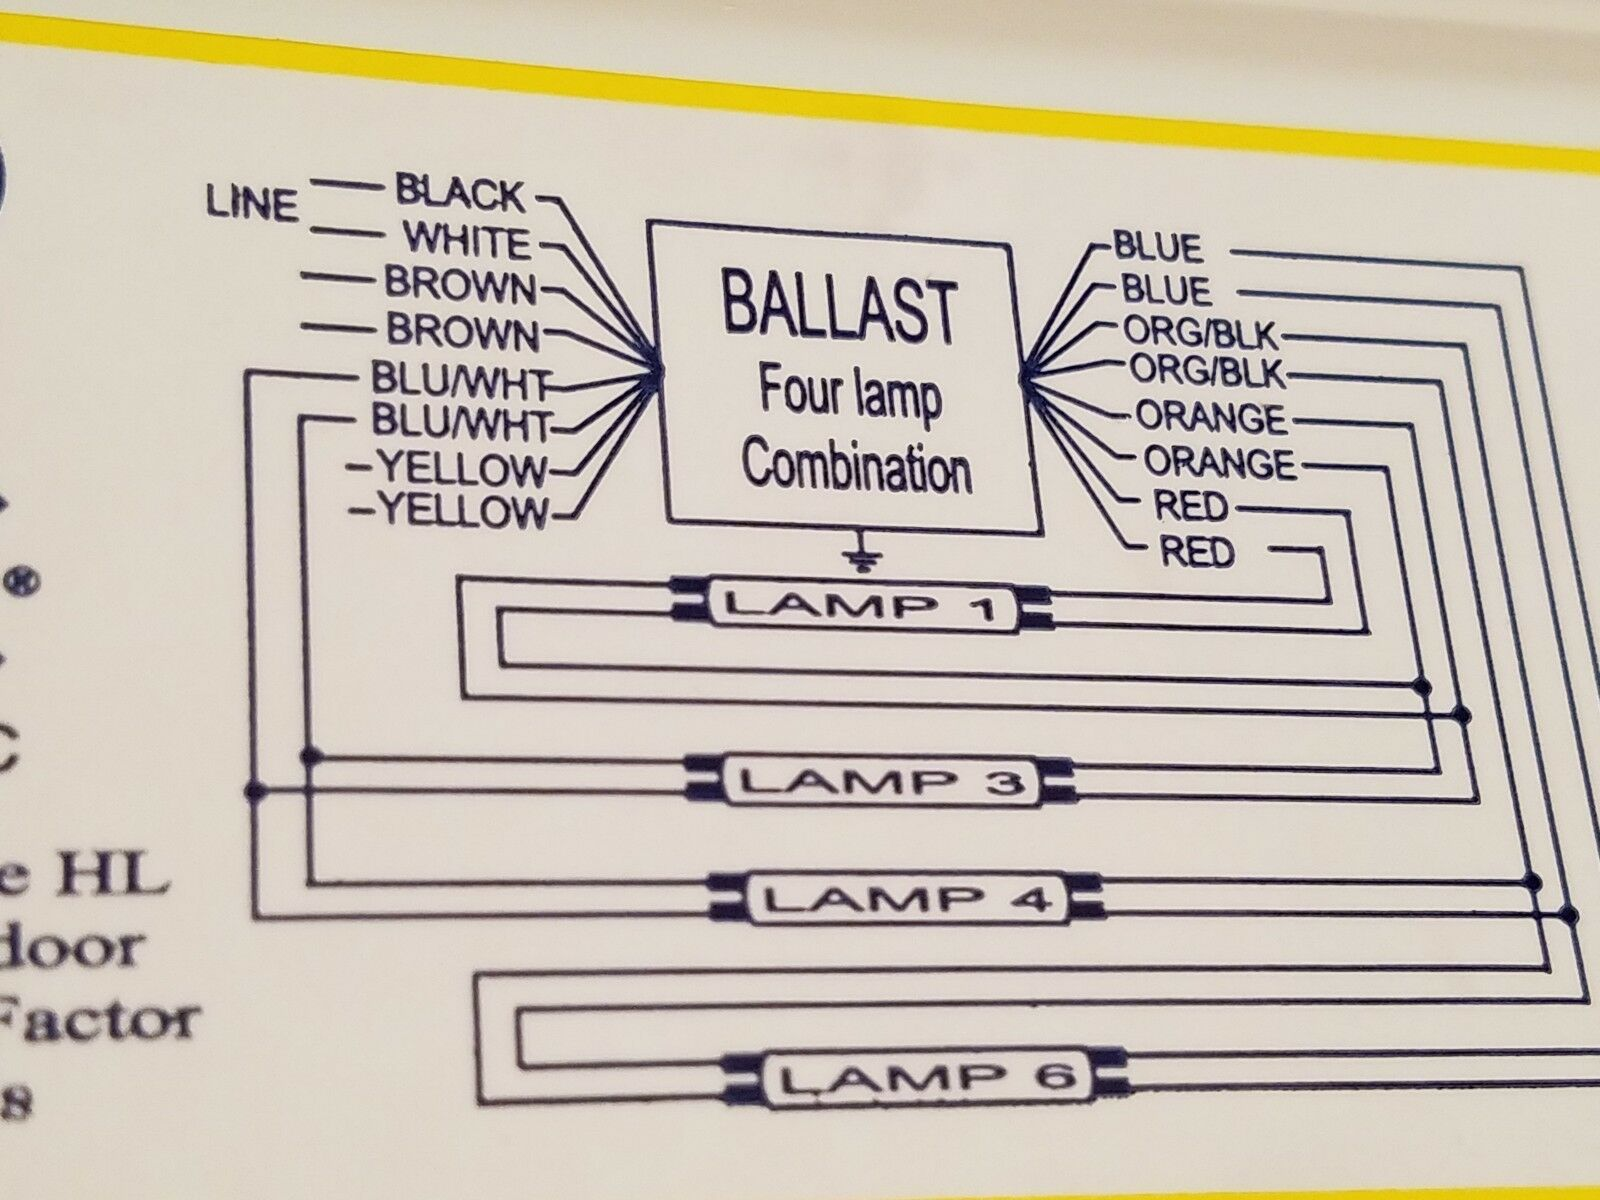 Peachy Asb Sign Ballast Wiring Diagram Sign Led Wiring Diagram Flashing Wiring 101 Mentrastrewellnesstrialsorg